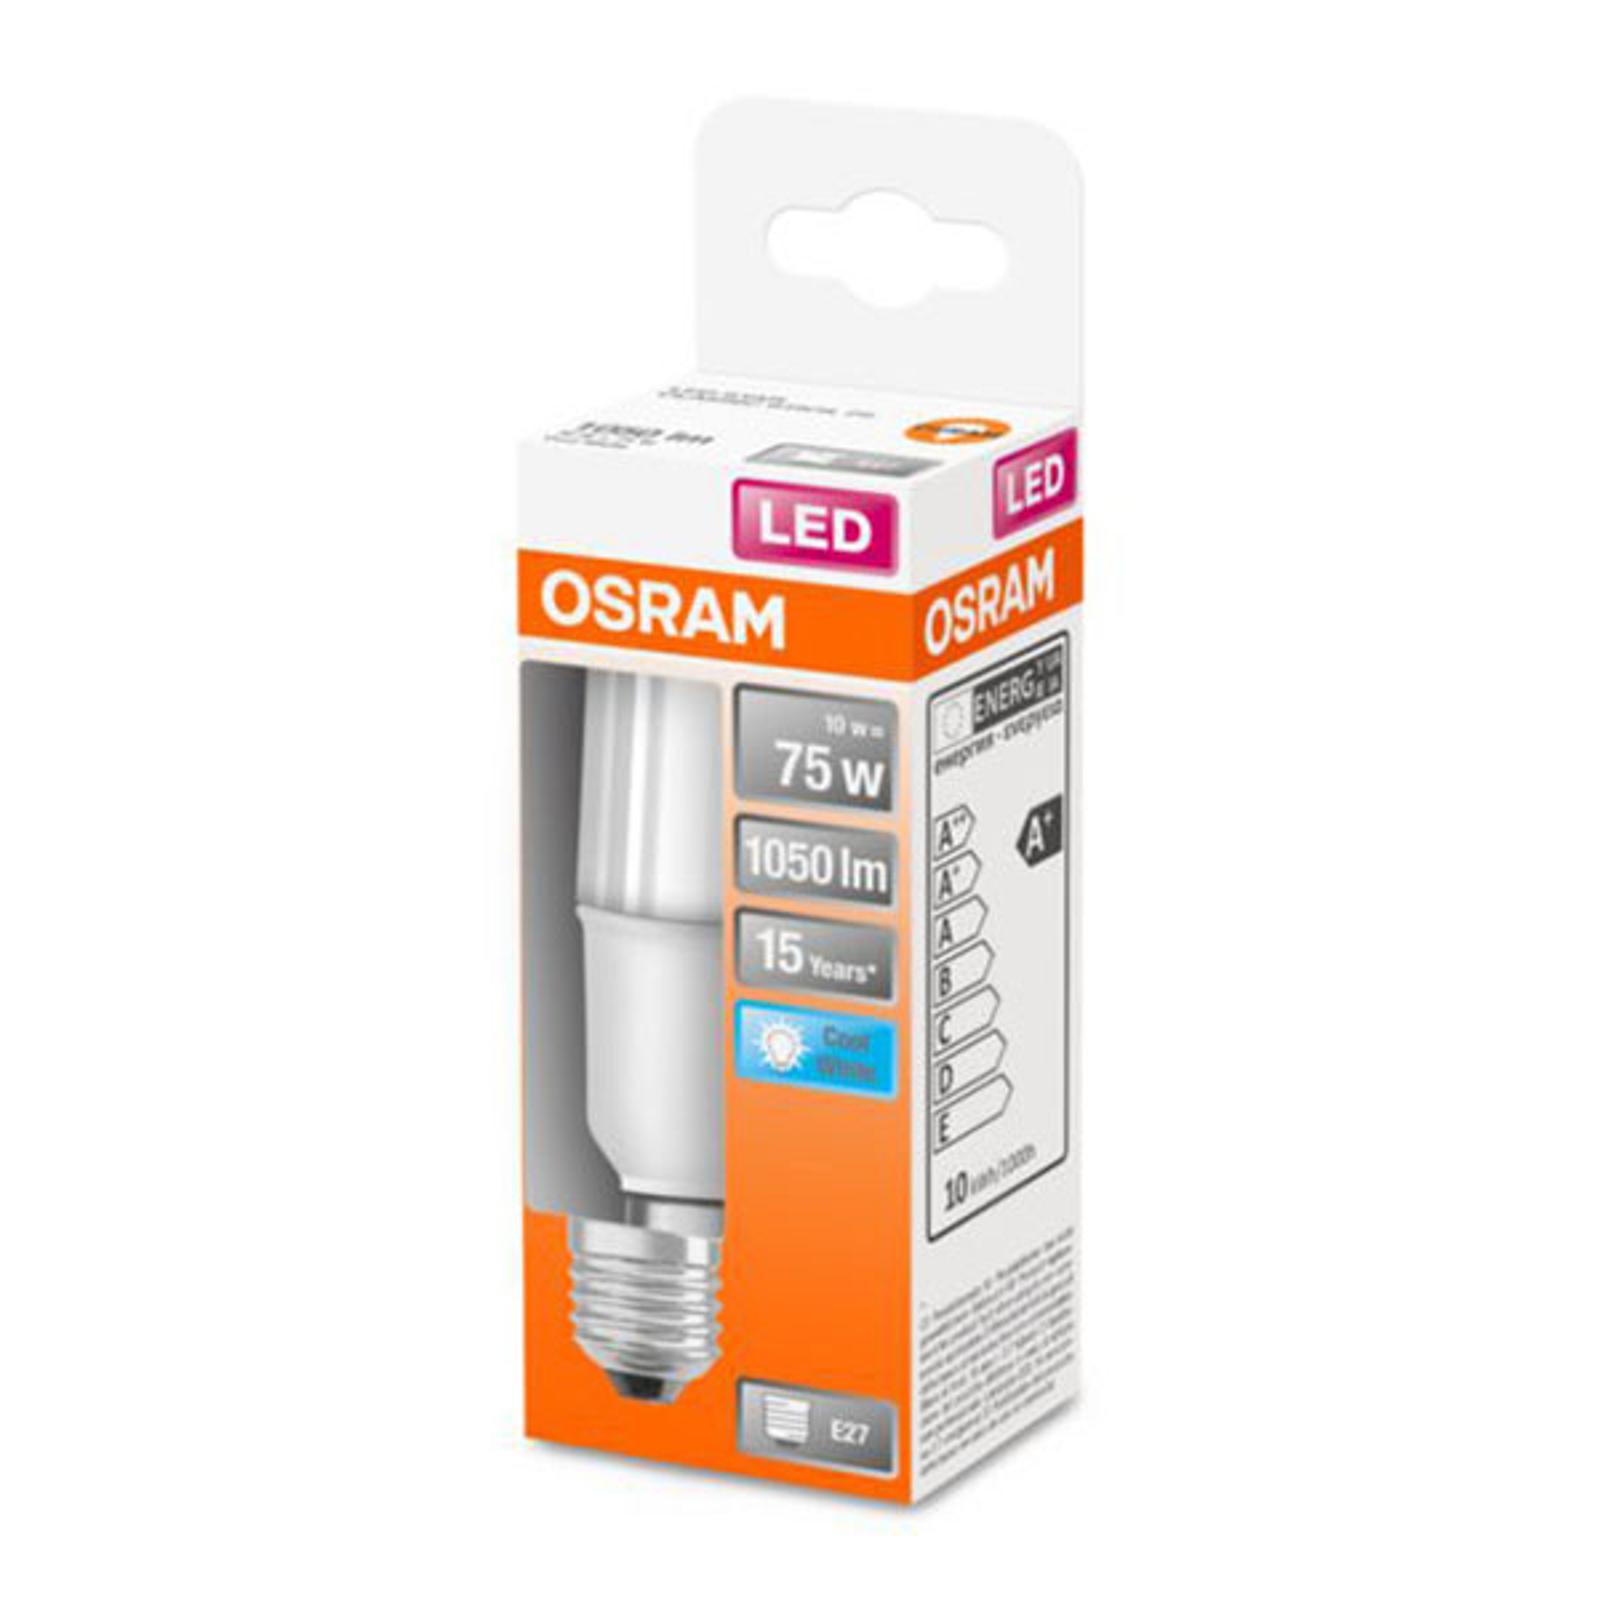 OSRAM-LED-lamppu Star Stick E27 10W 4 000 K matta